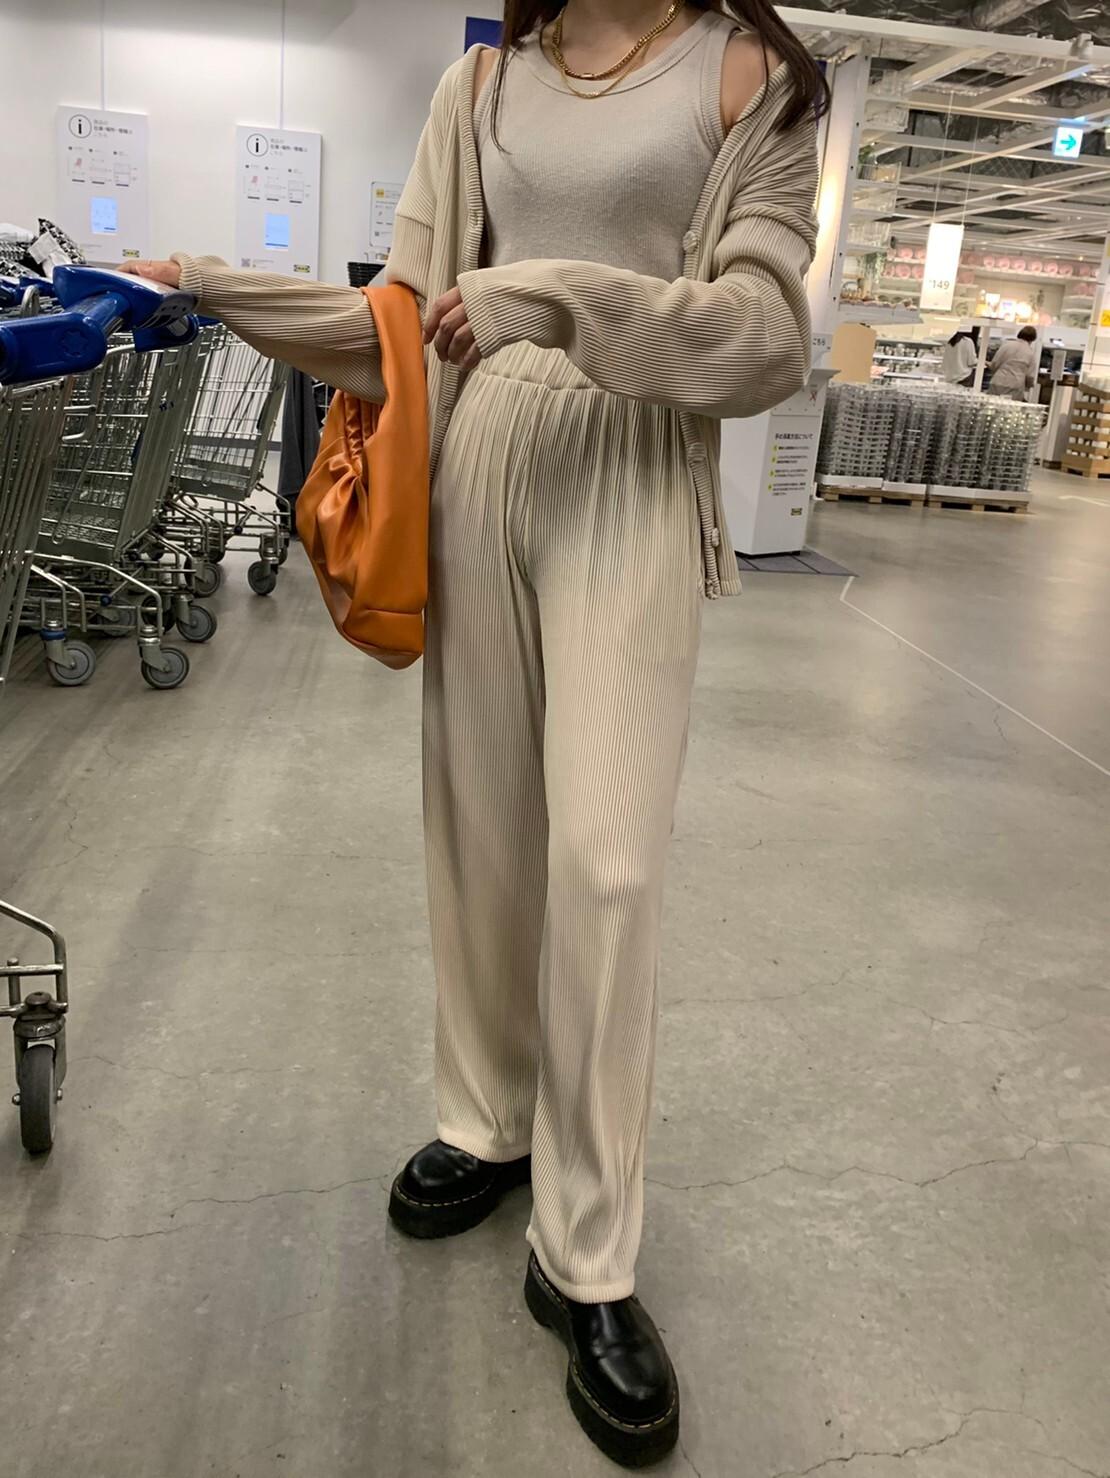 DAYNYC plane pleats pants